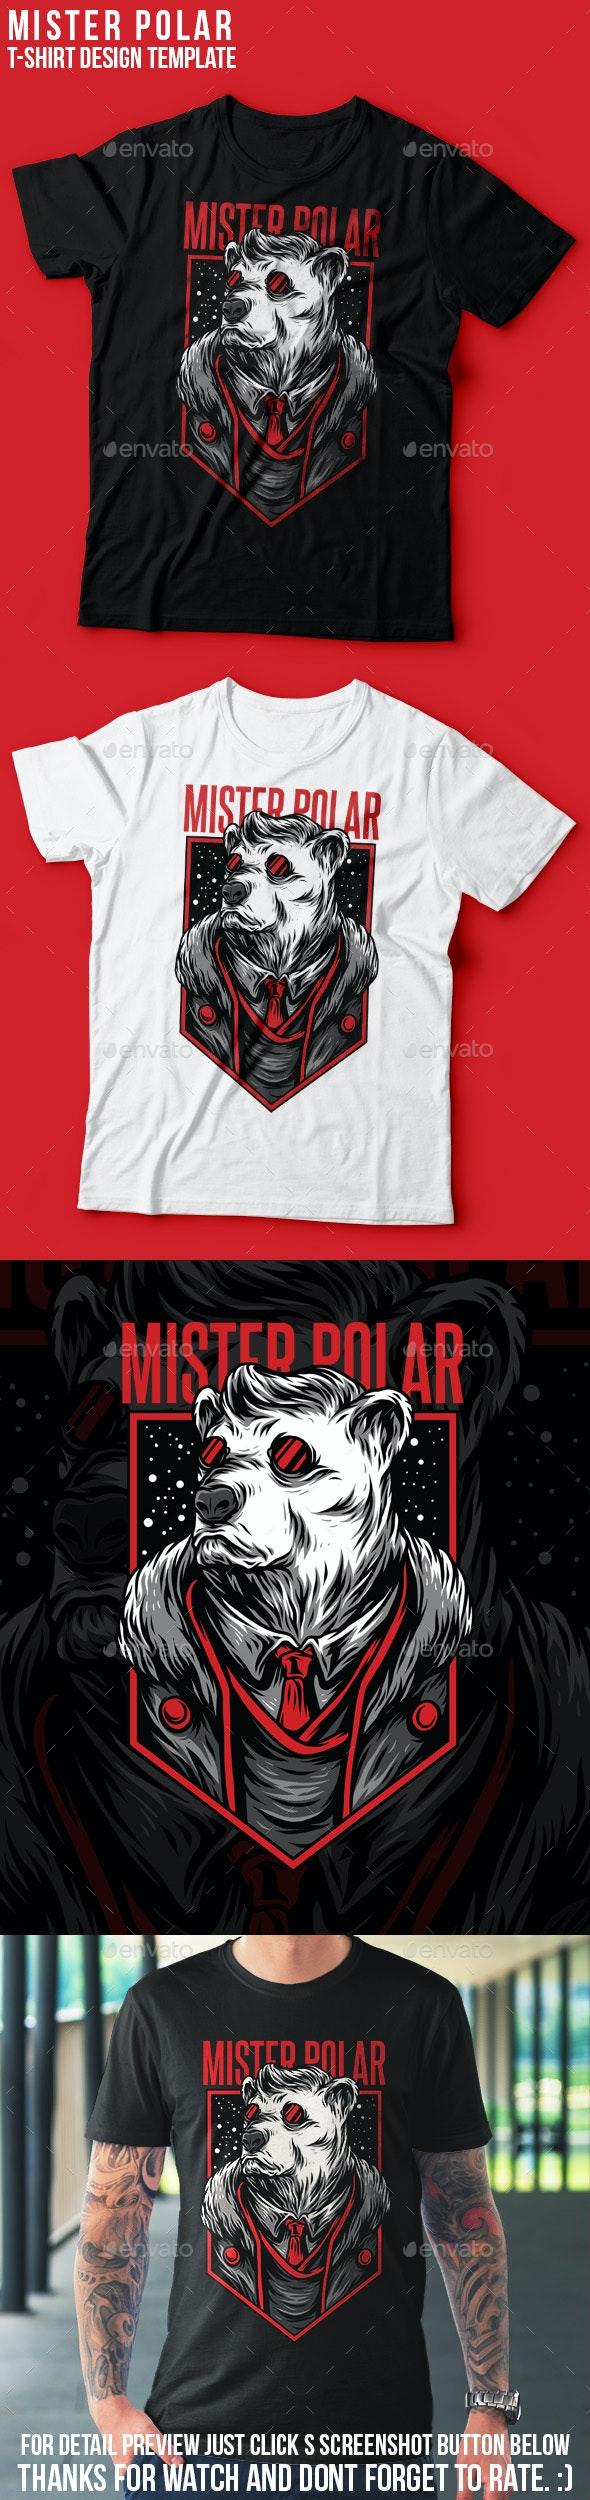 Mister Polar T-Shirt Design - Grunge Designs